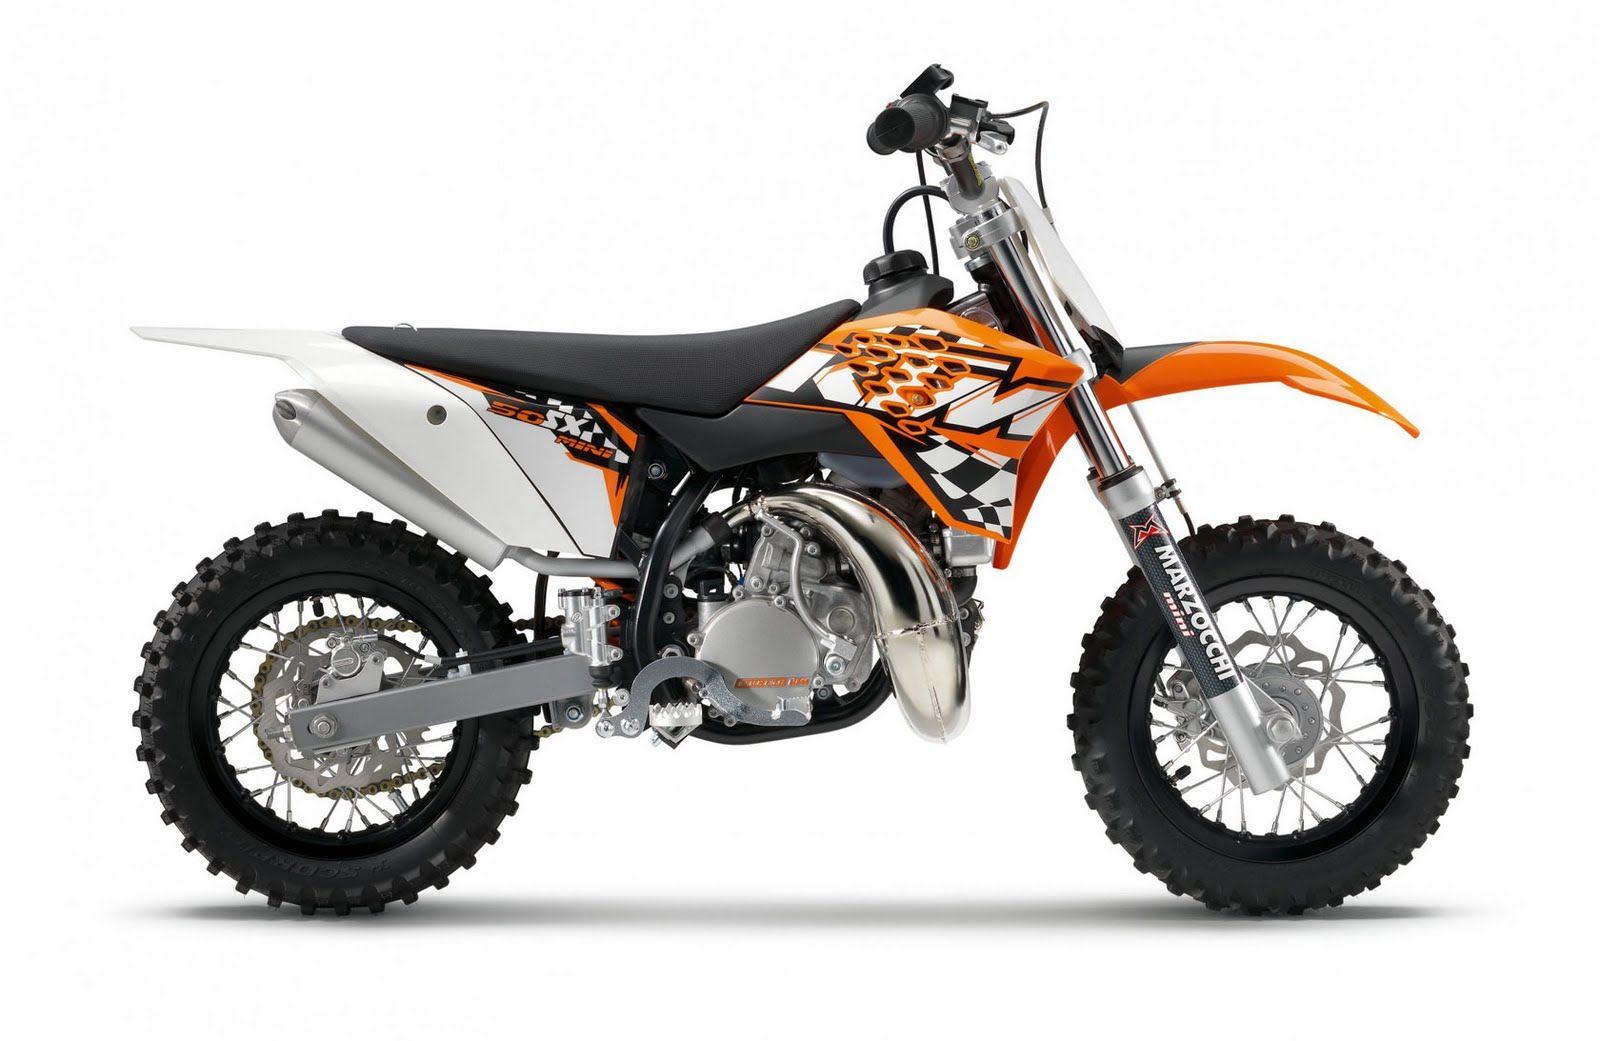 Ktm 50 Sx Fotos Y Especificaciones Tecnicas Ref 99198 Dirt Bikes For Kids Ktm Ktm Dirt Bikes